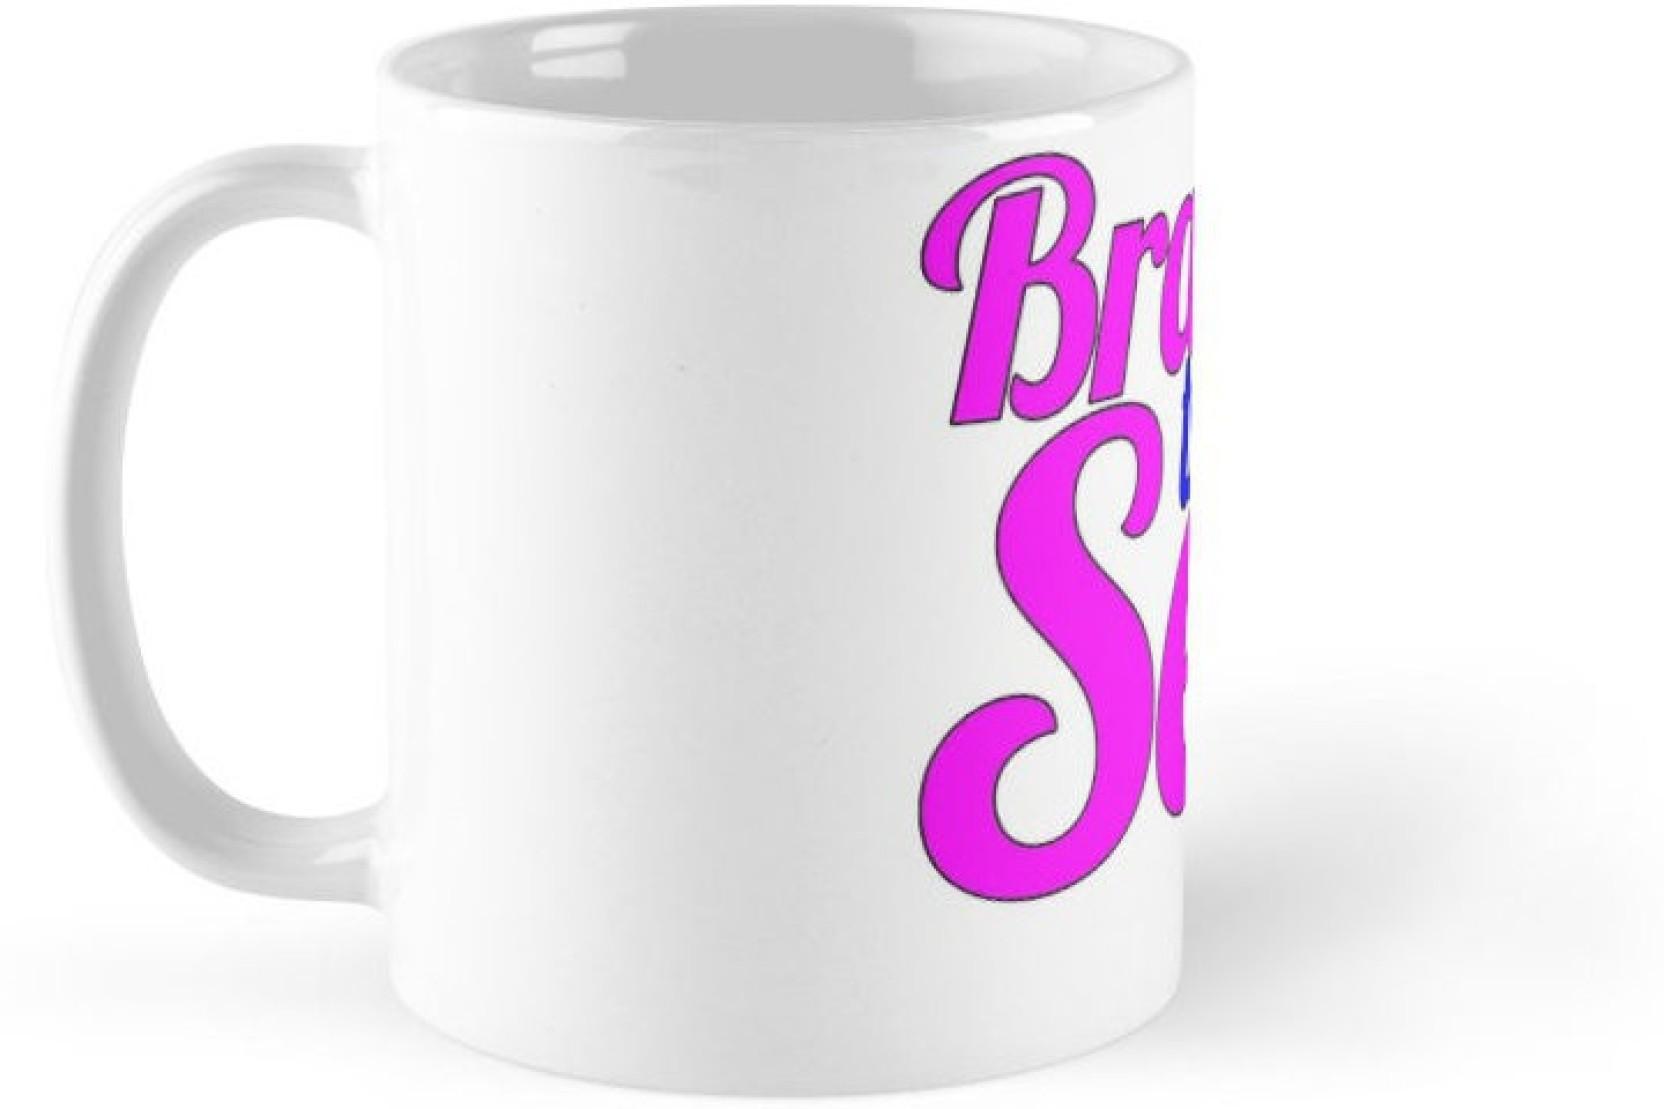 Brainy is the new sexy mug